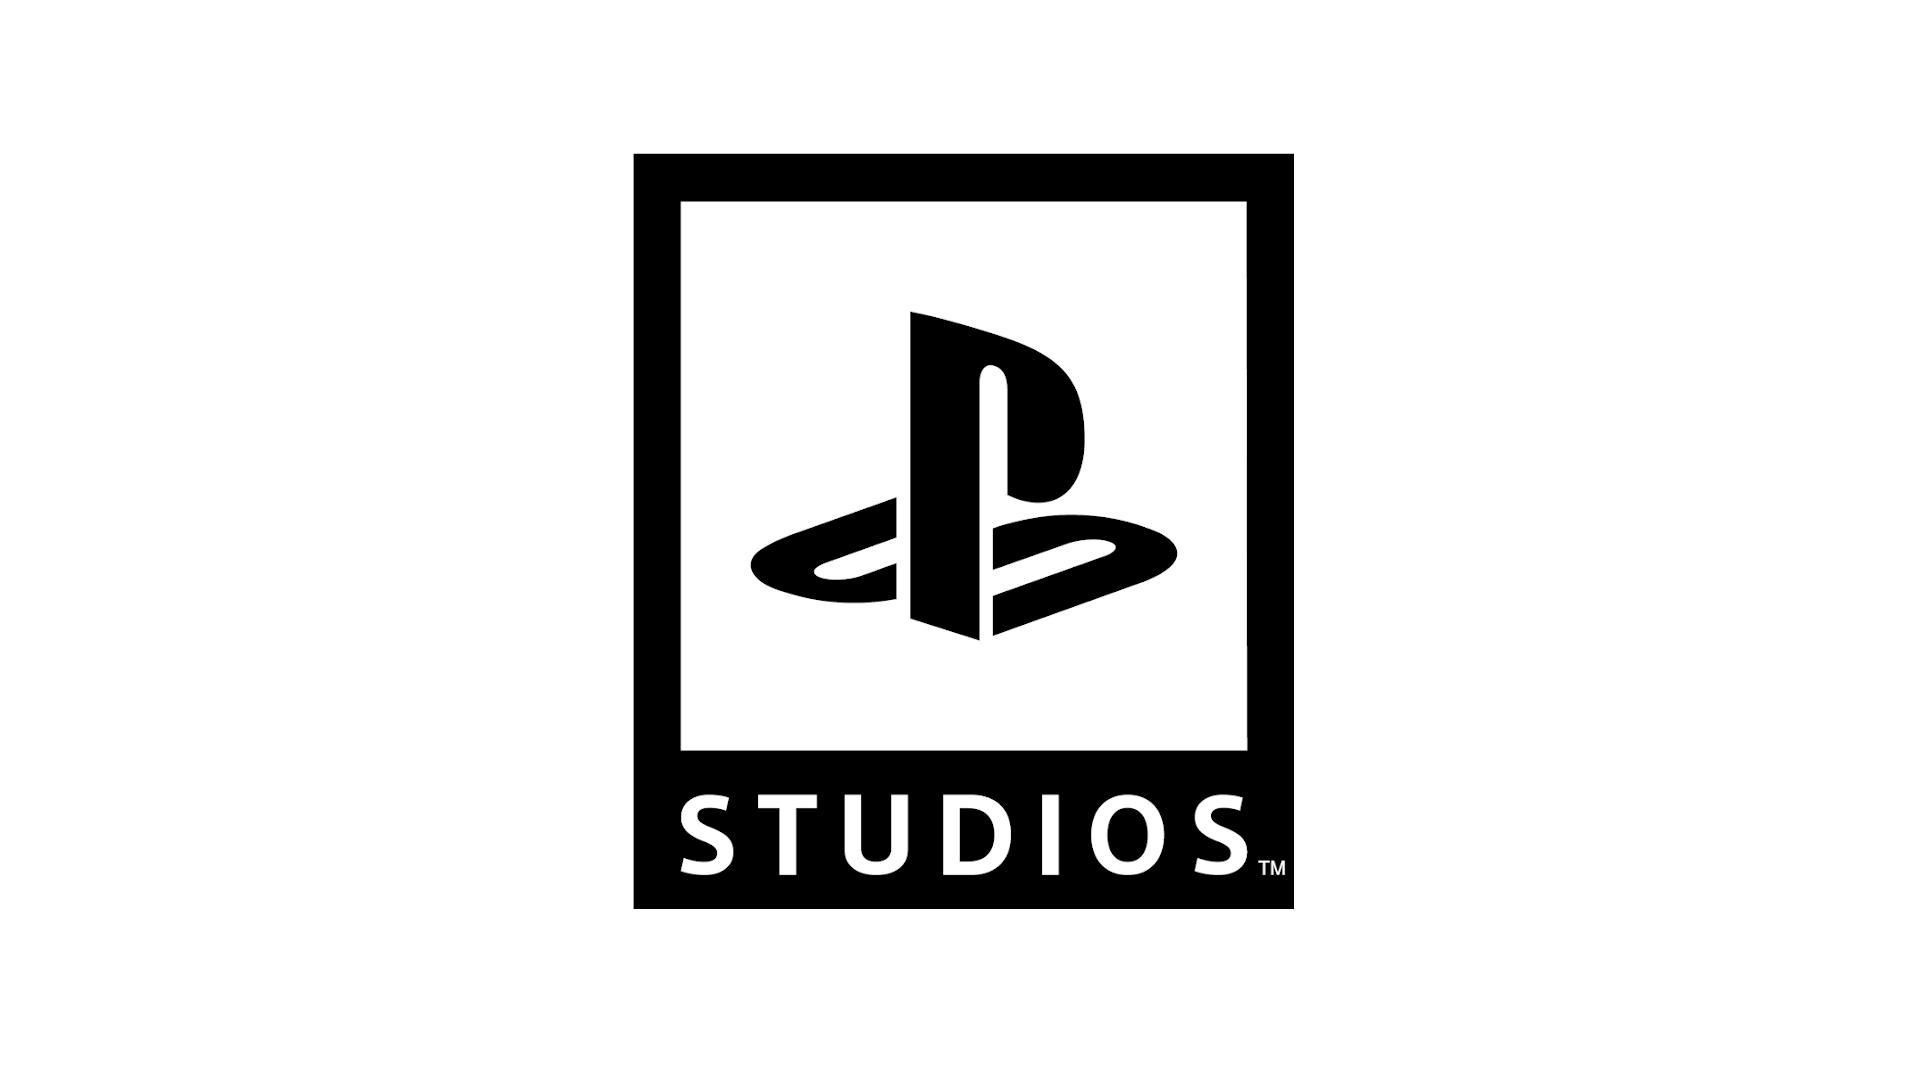 PlayStation Studios Logo